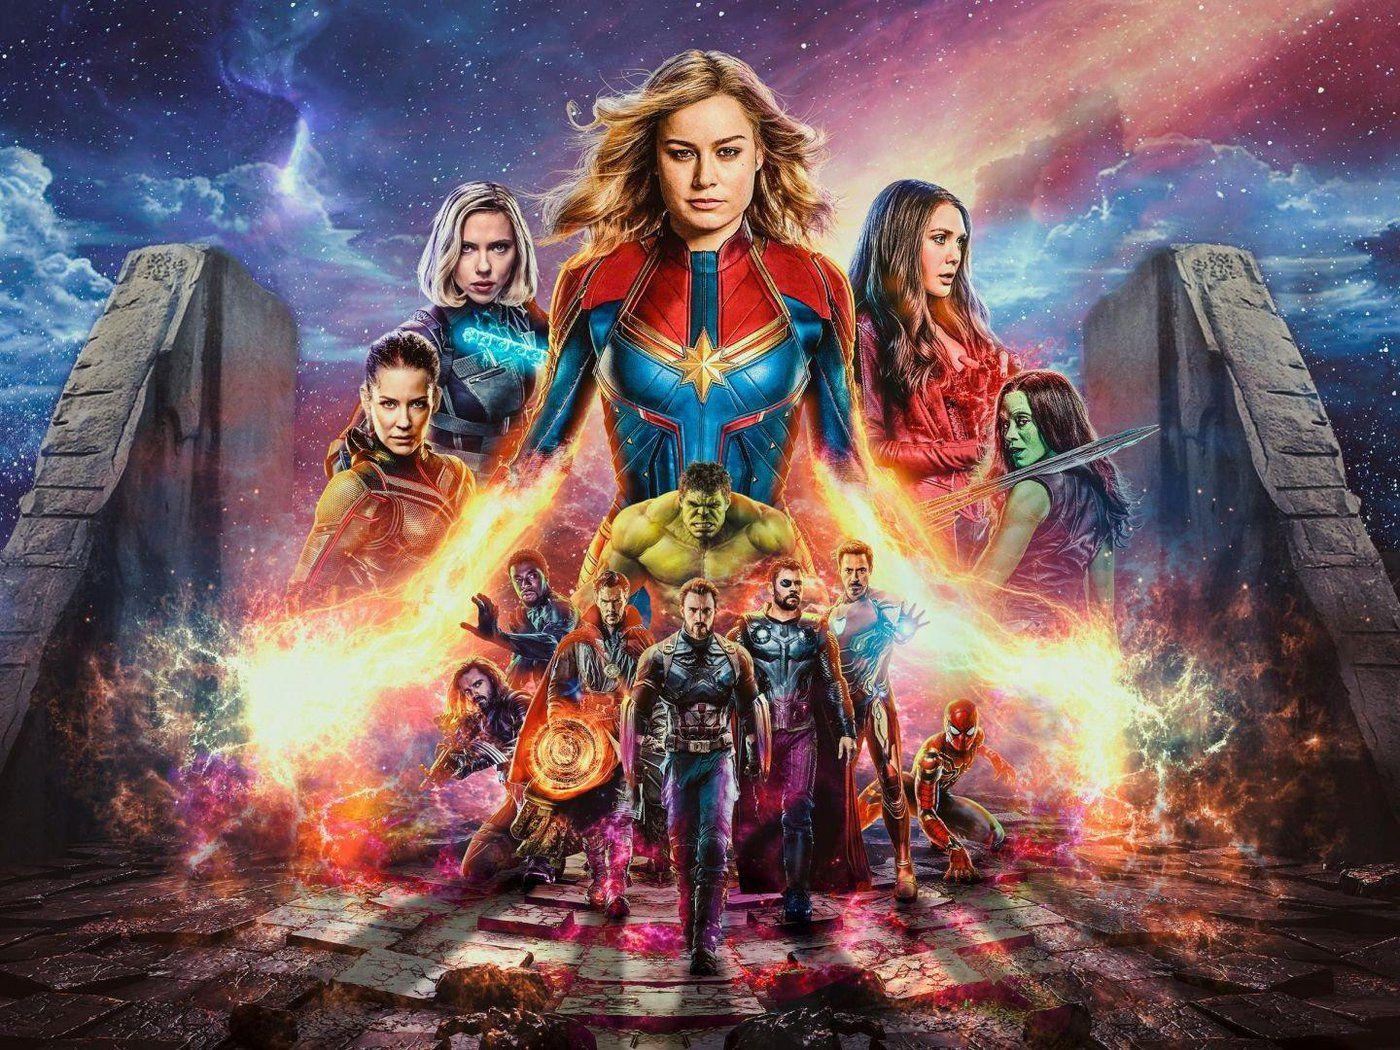 Download Avengers Endgame Film Cast For Fullscreen Wallpaper Movies Wallpaper For Phone Peliculas Completas Fondo De Pantalla De Avengers Peliculas Marvel